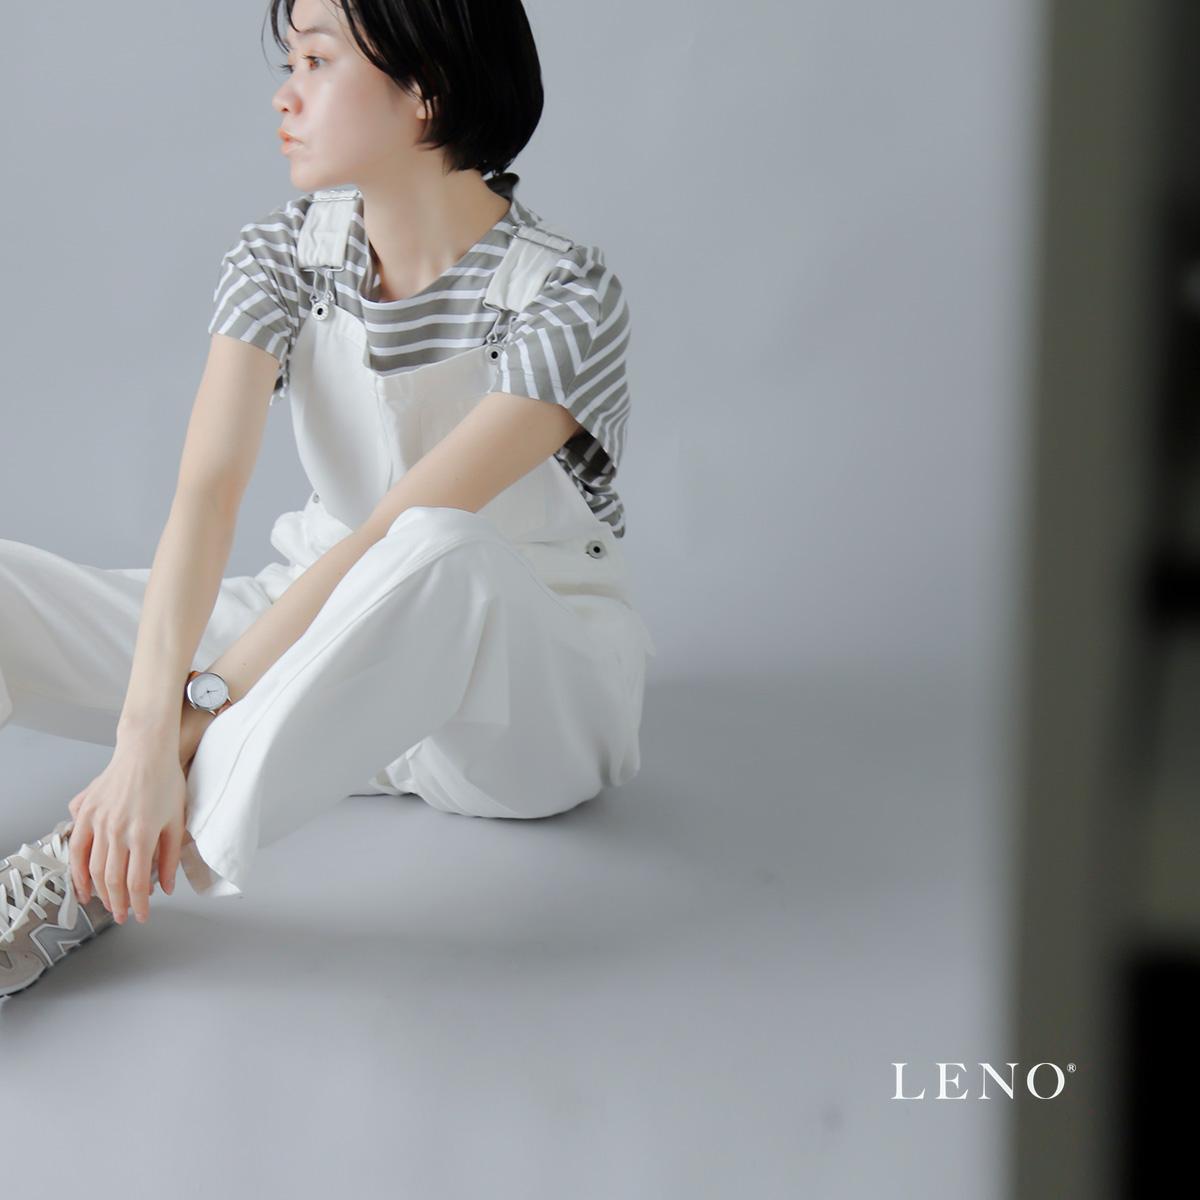 LENO(リノ)セルヴィッチデニムオーバーオール leno-pt005w